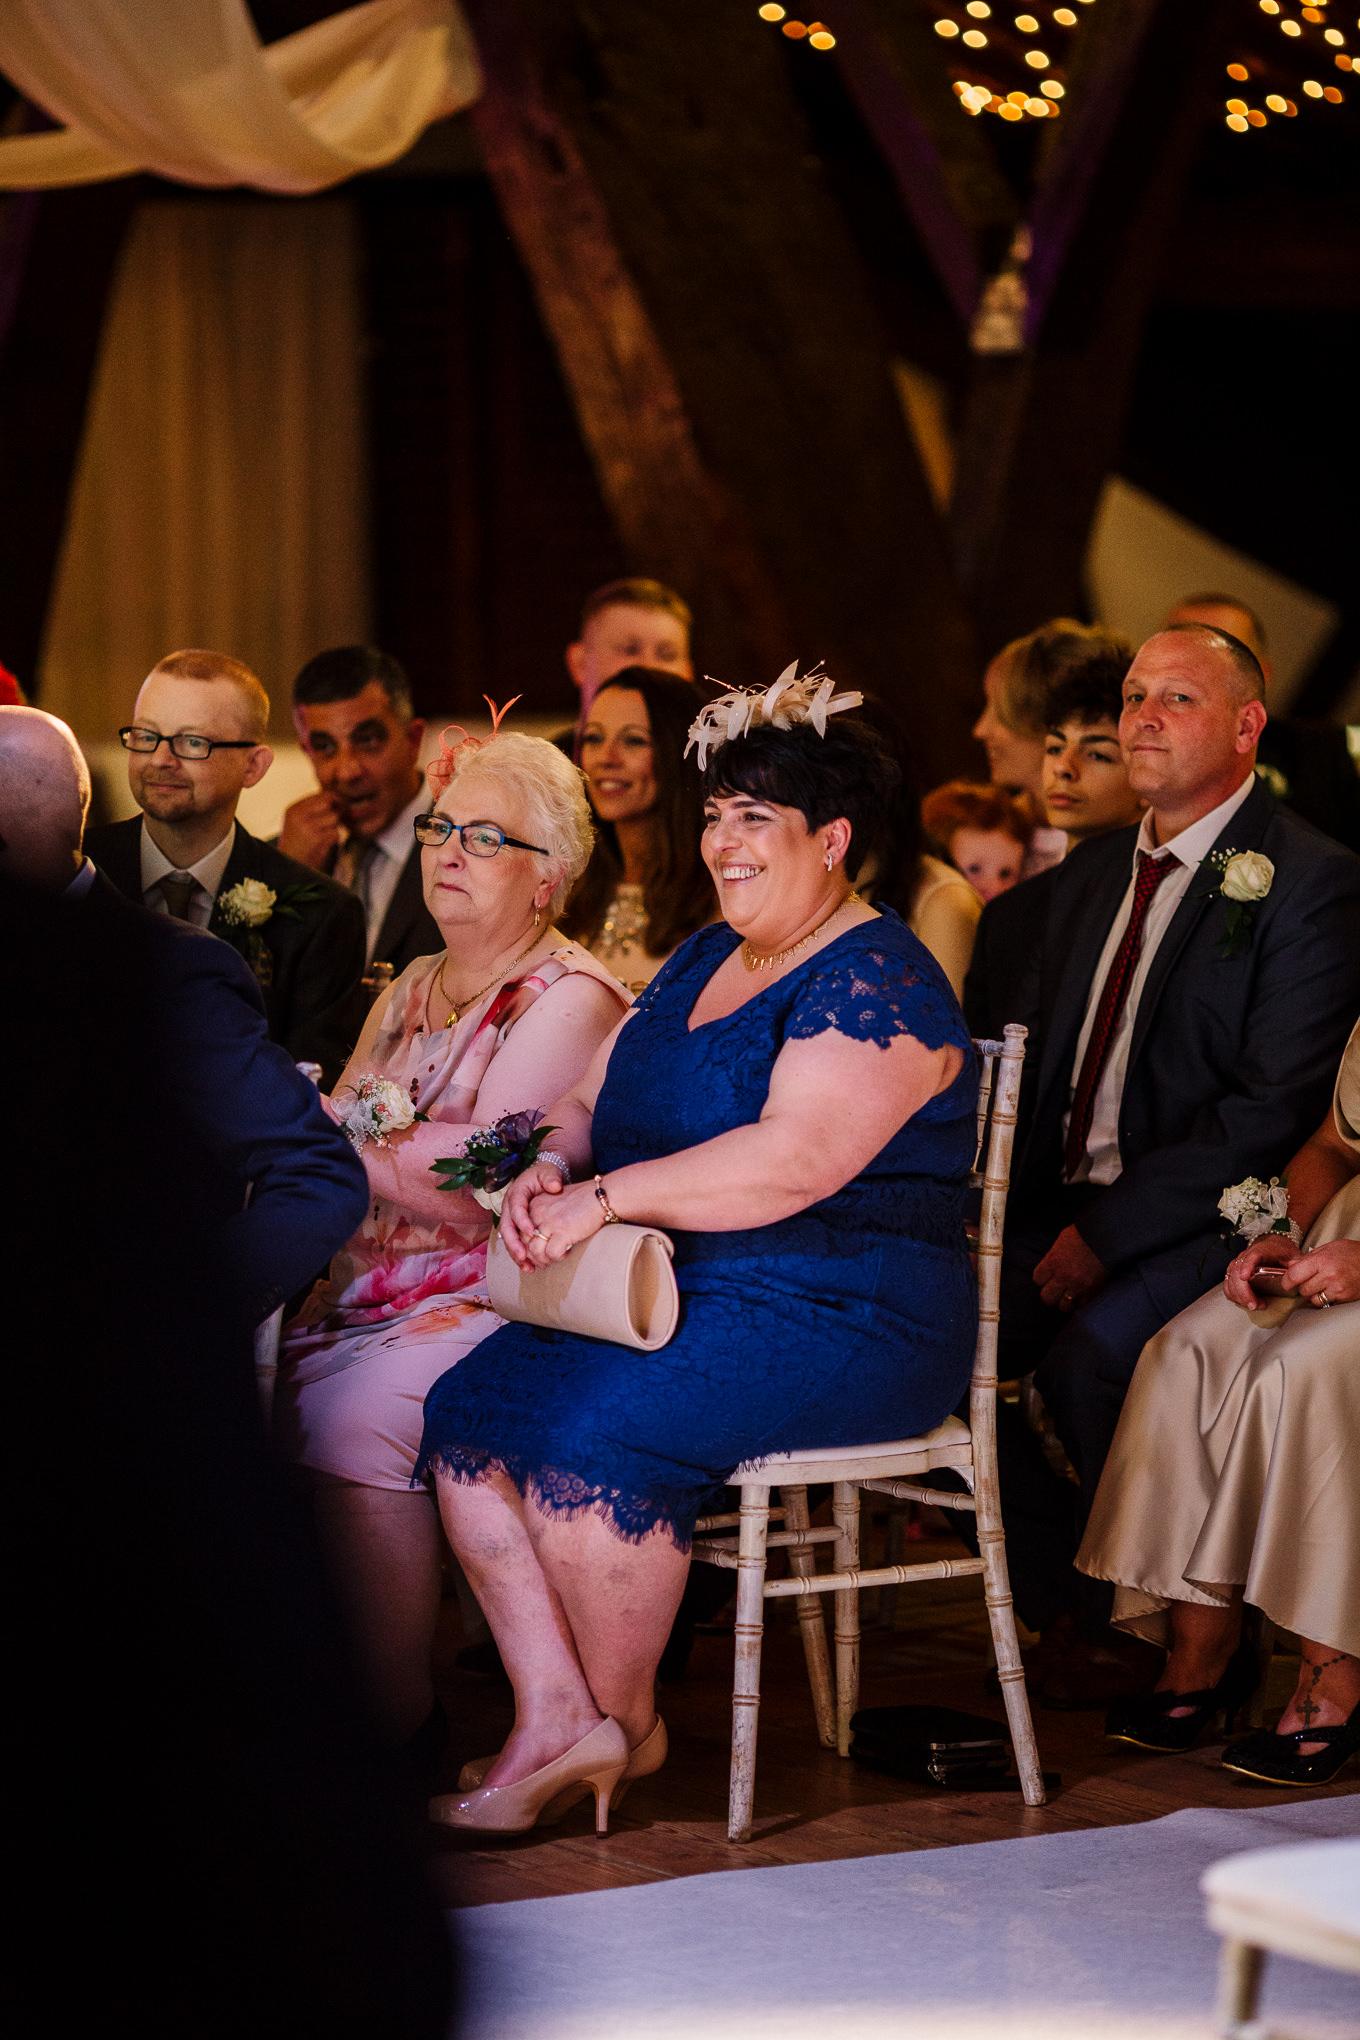 Grooms mum during wedding ceremony